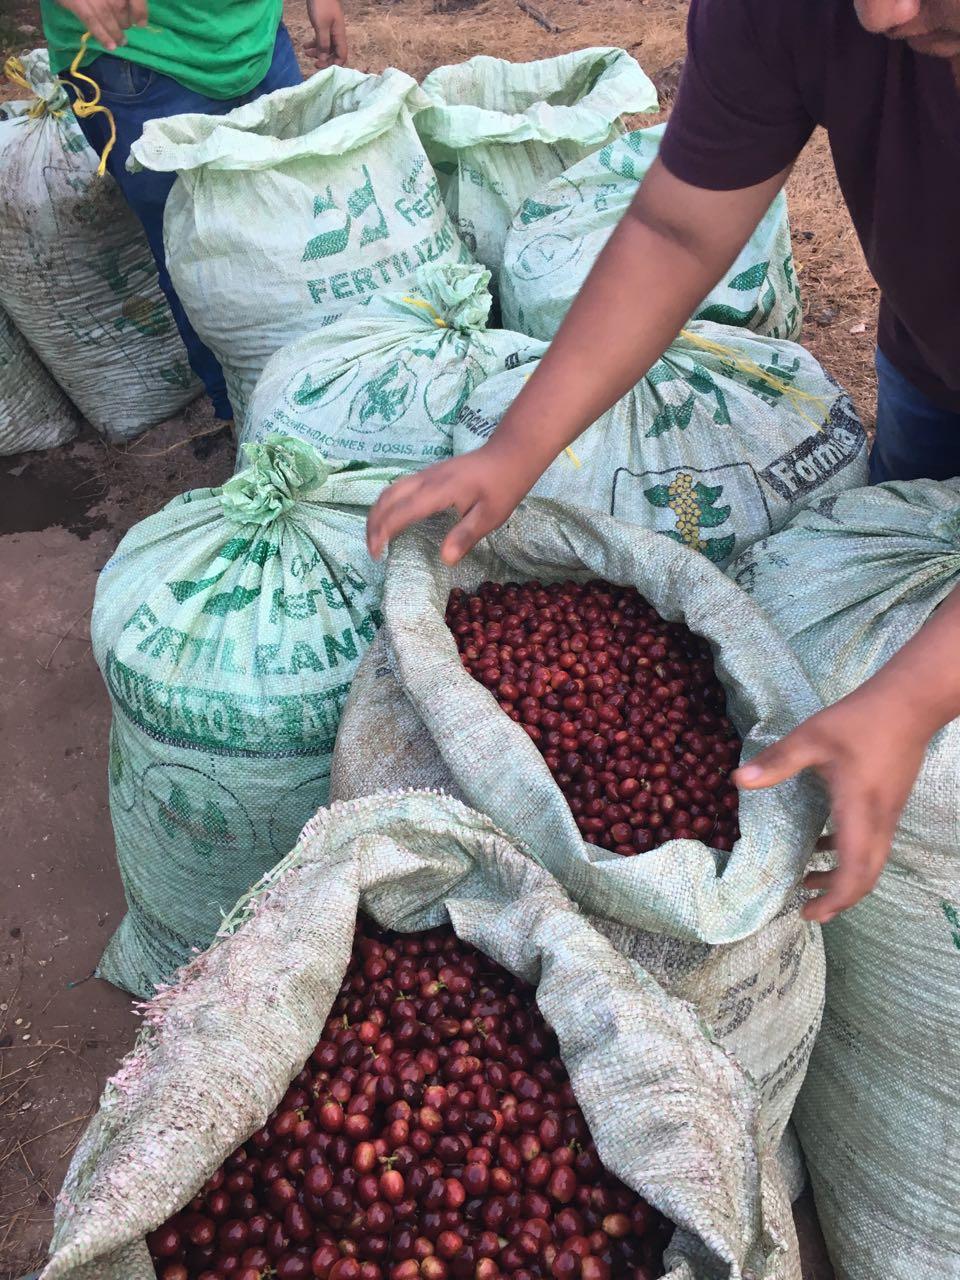 el-salvador-picked-coffee-cherries